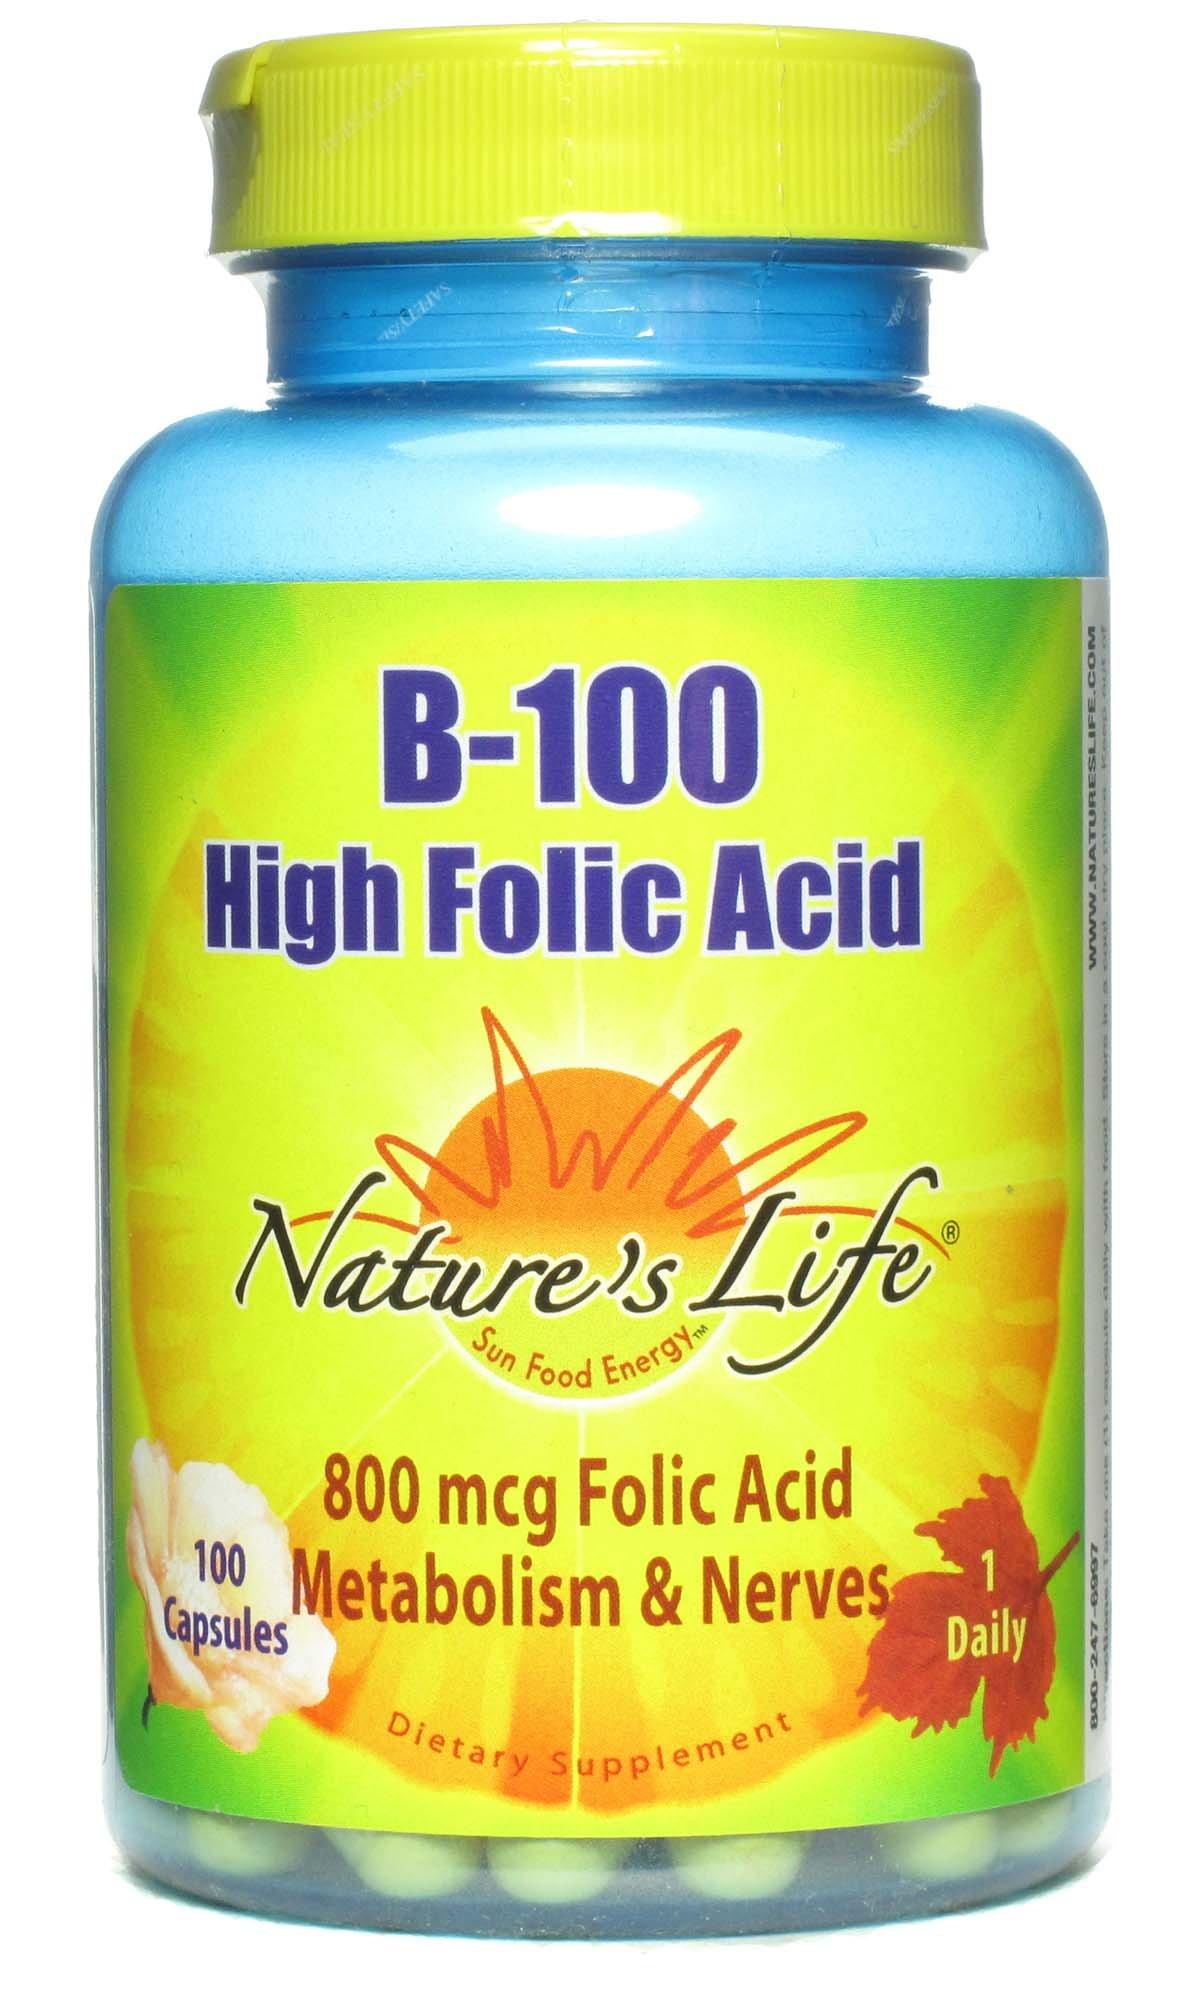 Nature's Life B--100 High Folic Acid, 100 Mg, 100 Capsules (Pack of 3)